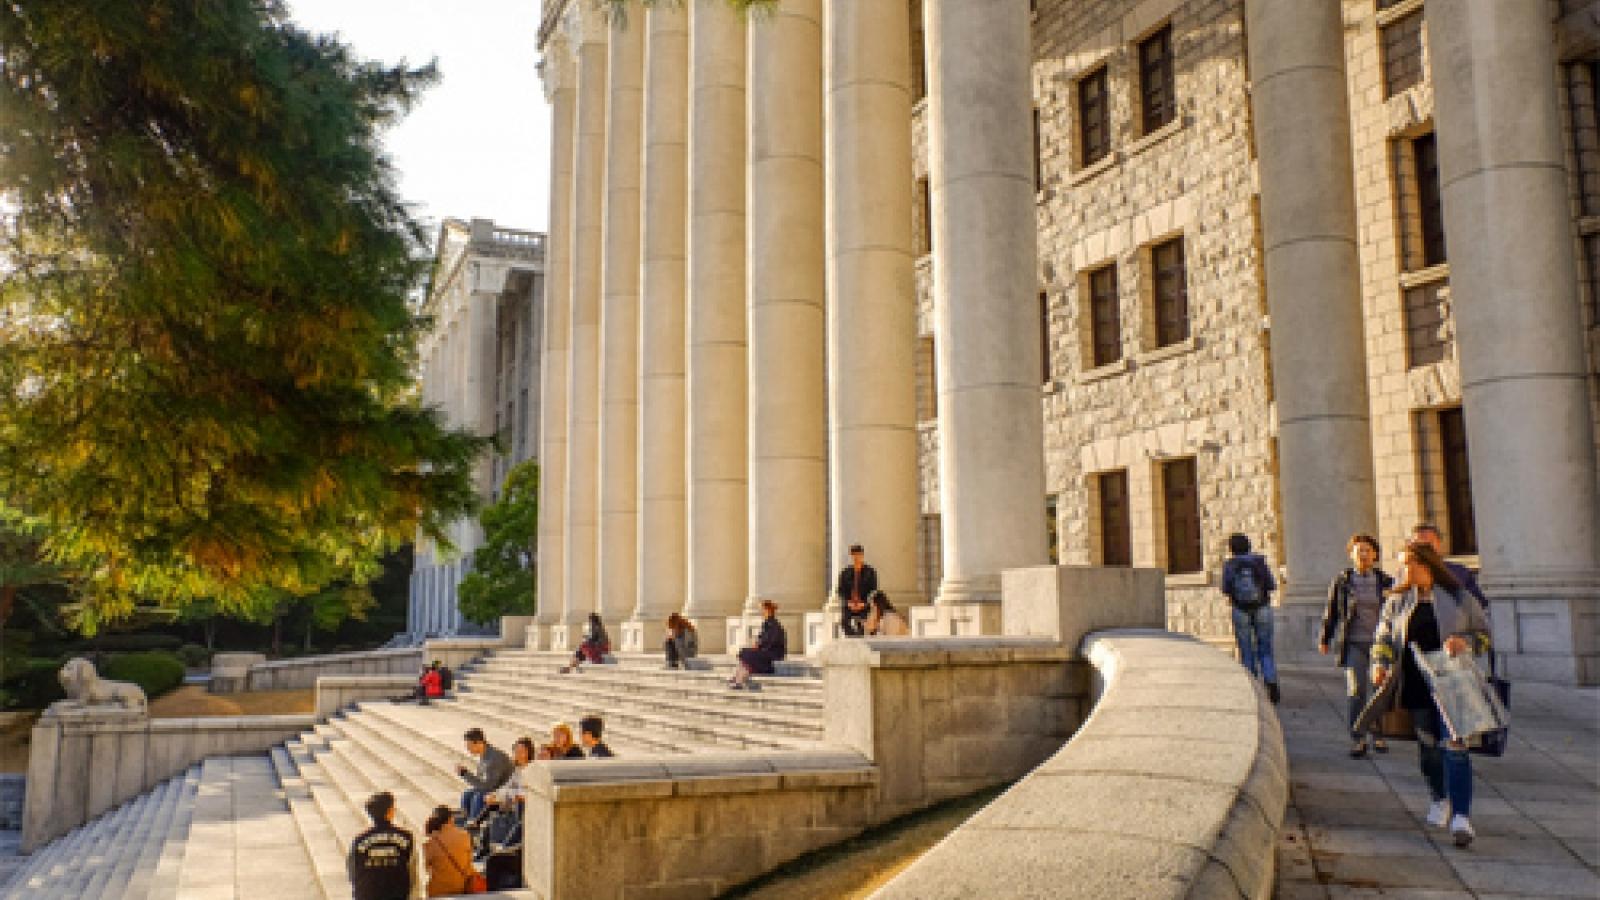 RoK tightens visa rules for Vietnamese students